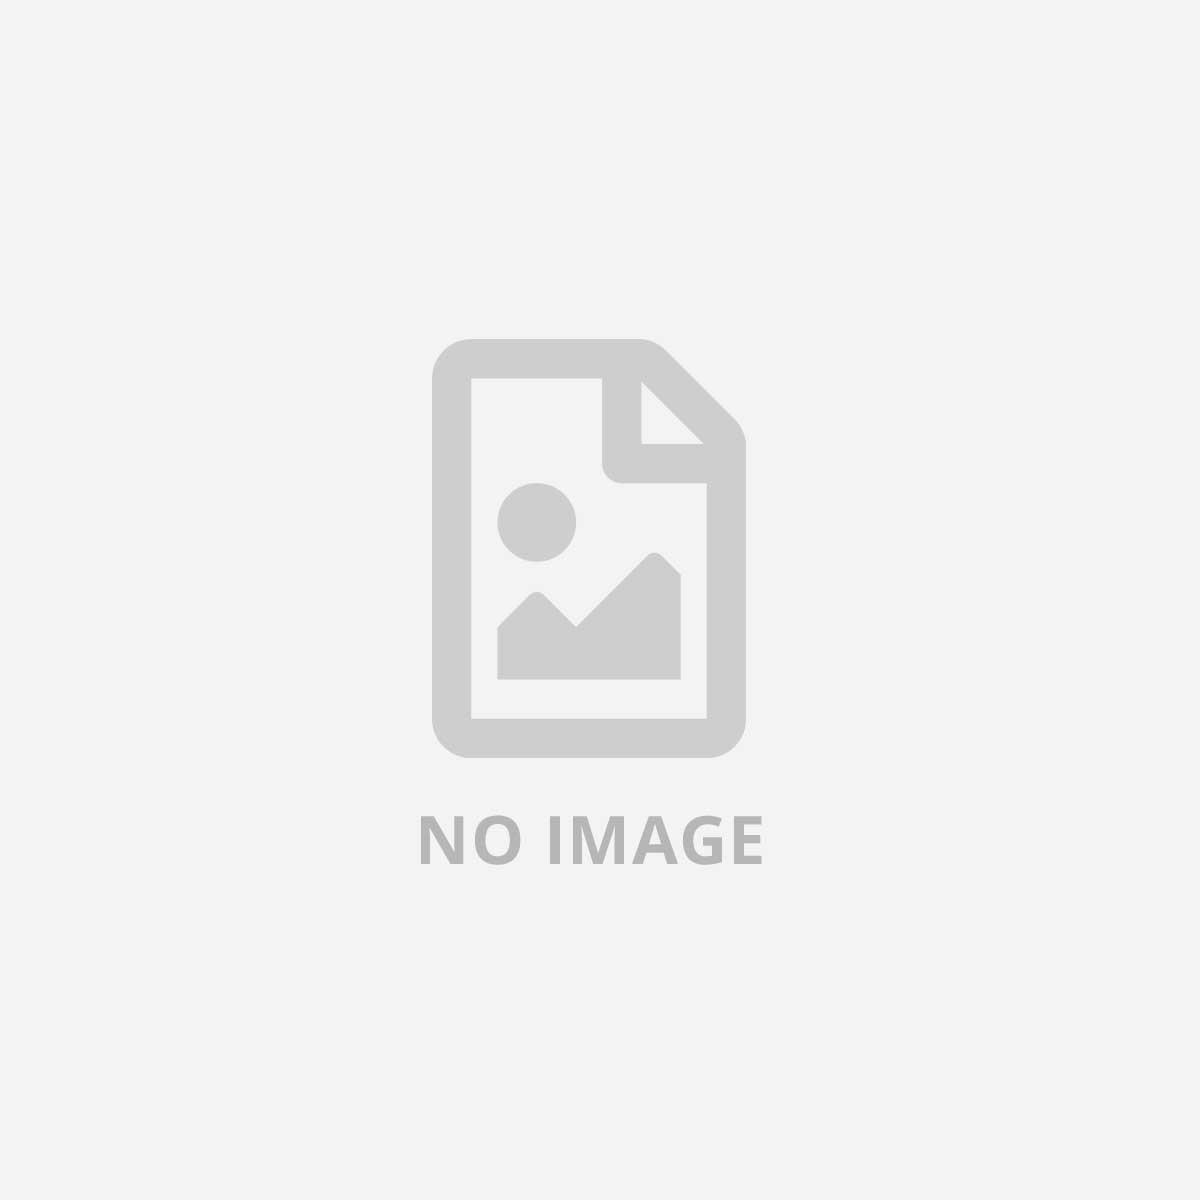 WATCHGUARD PANDA PATCH MANAGEMENT - 1 ANNO